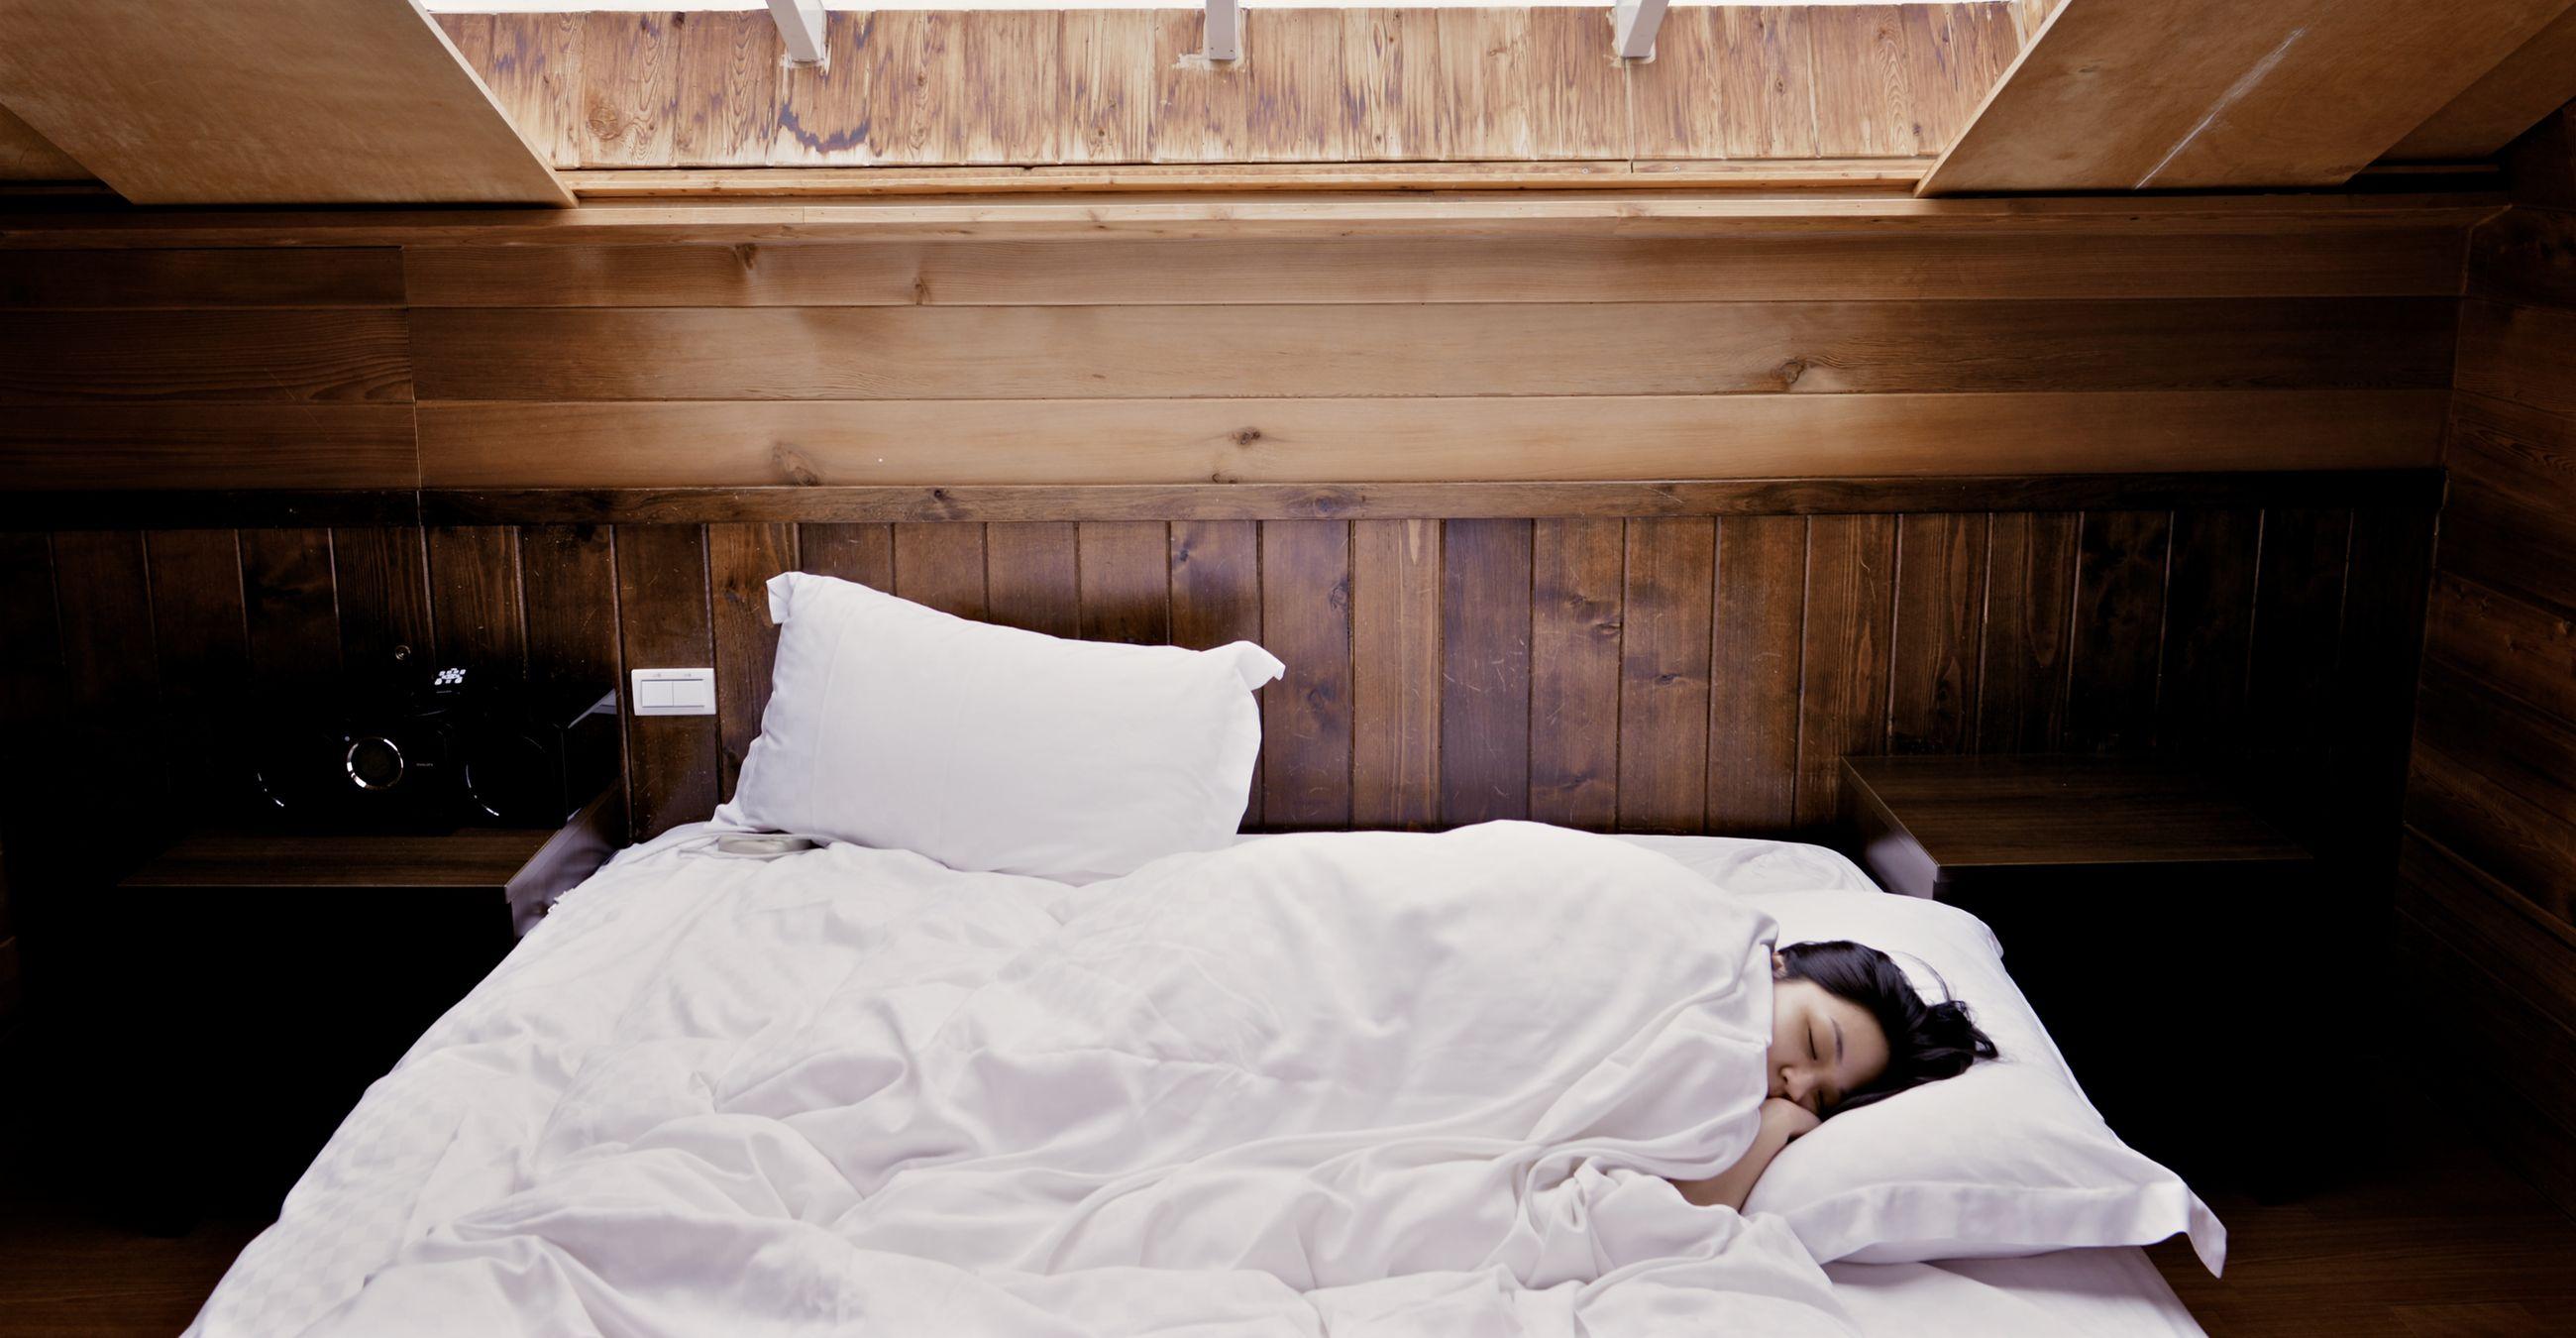 keystone habits sleep